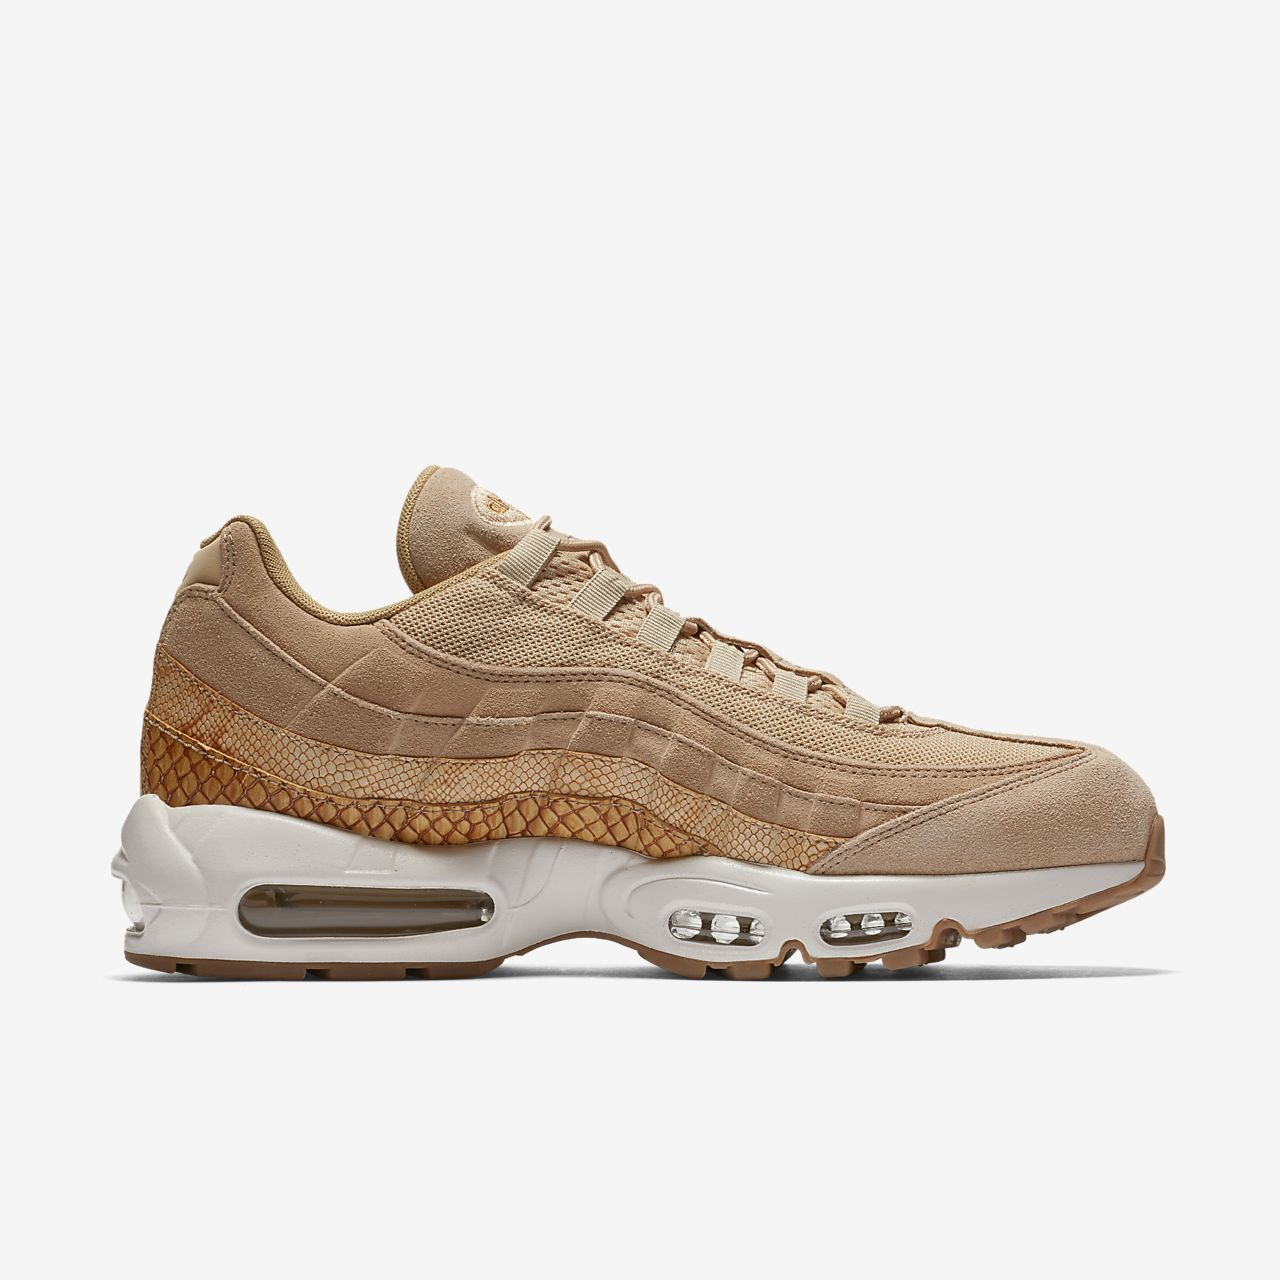 ... Nike Air Max 95 Premium SE Men's Shoe